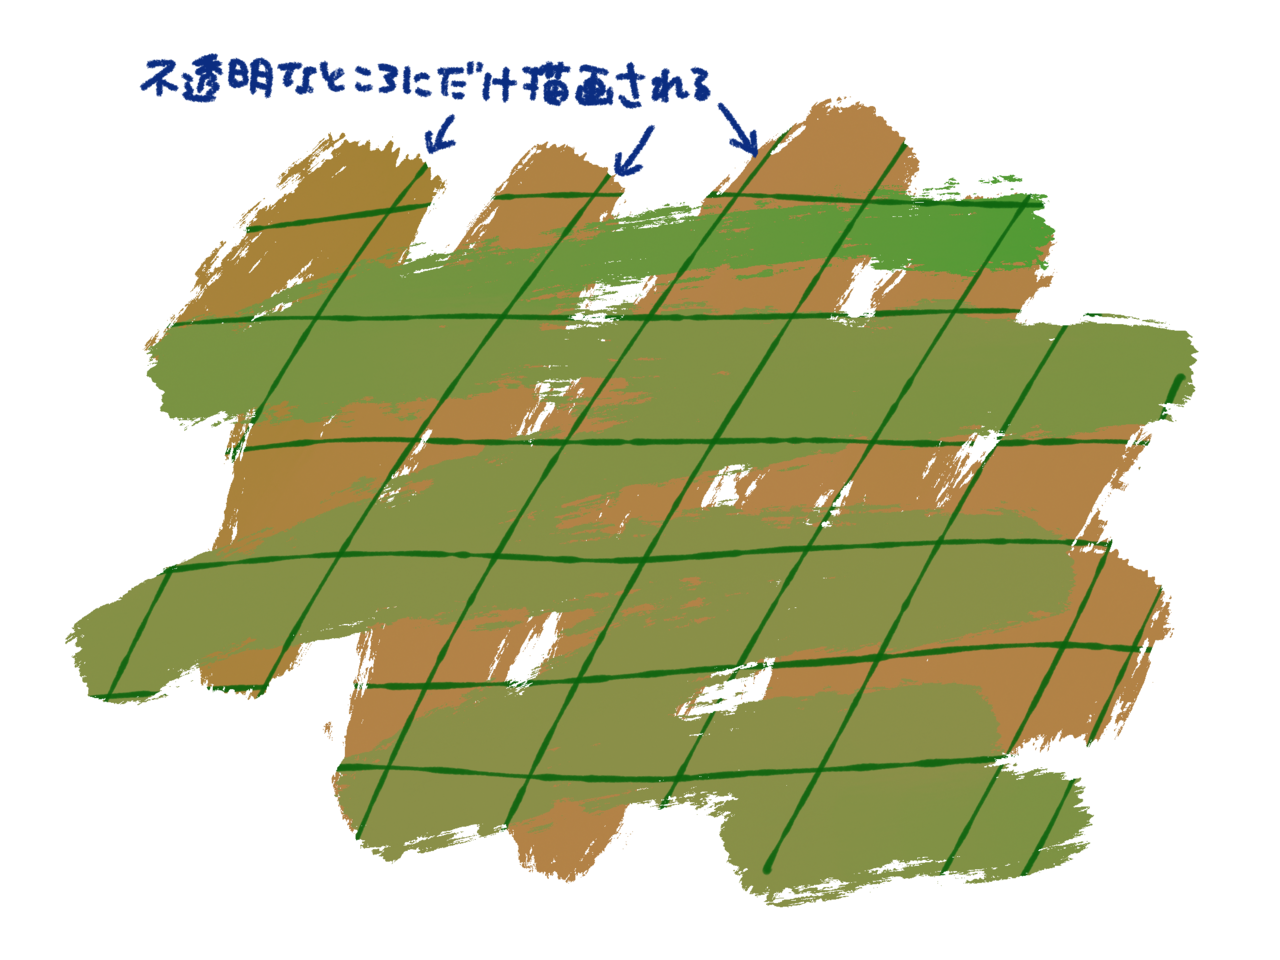 f:id:Imamura:20200421011326p:plain